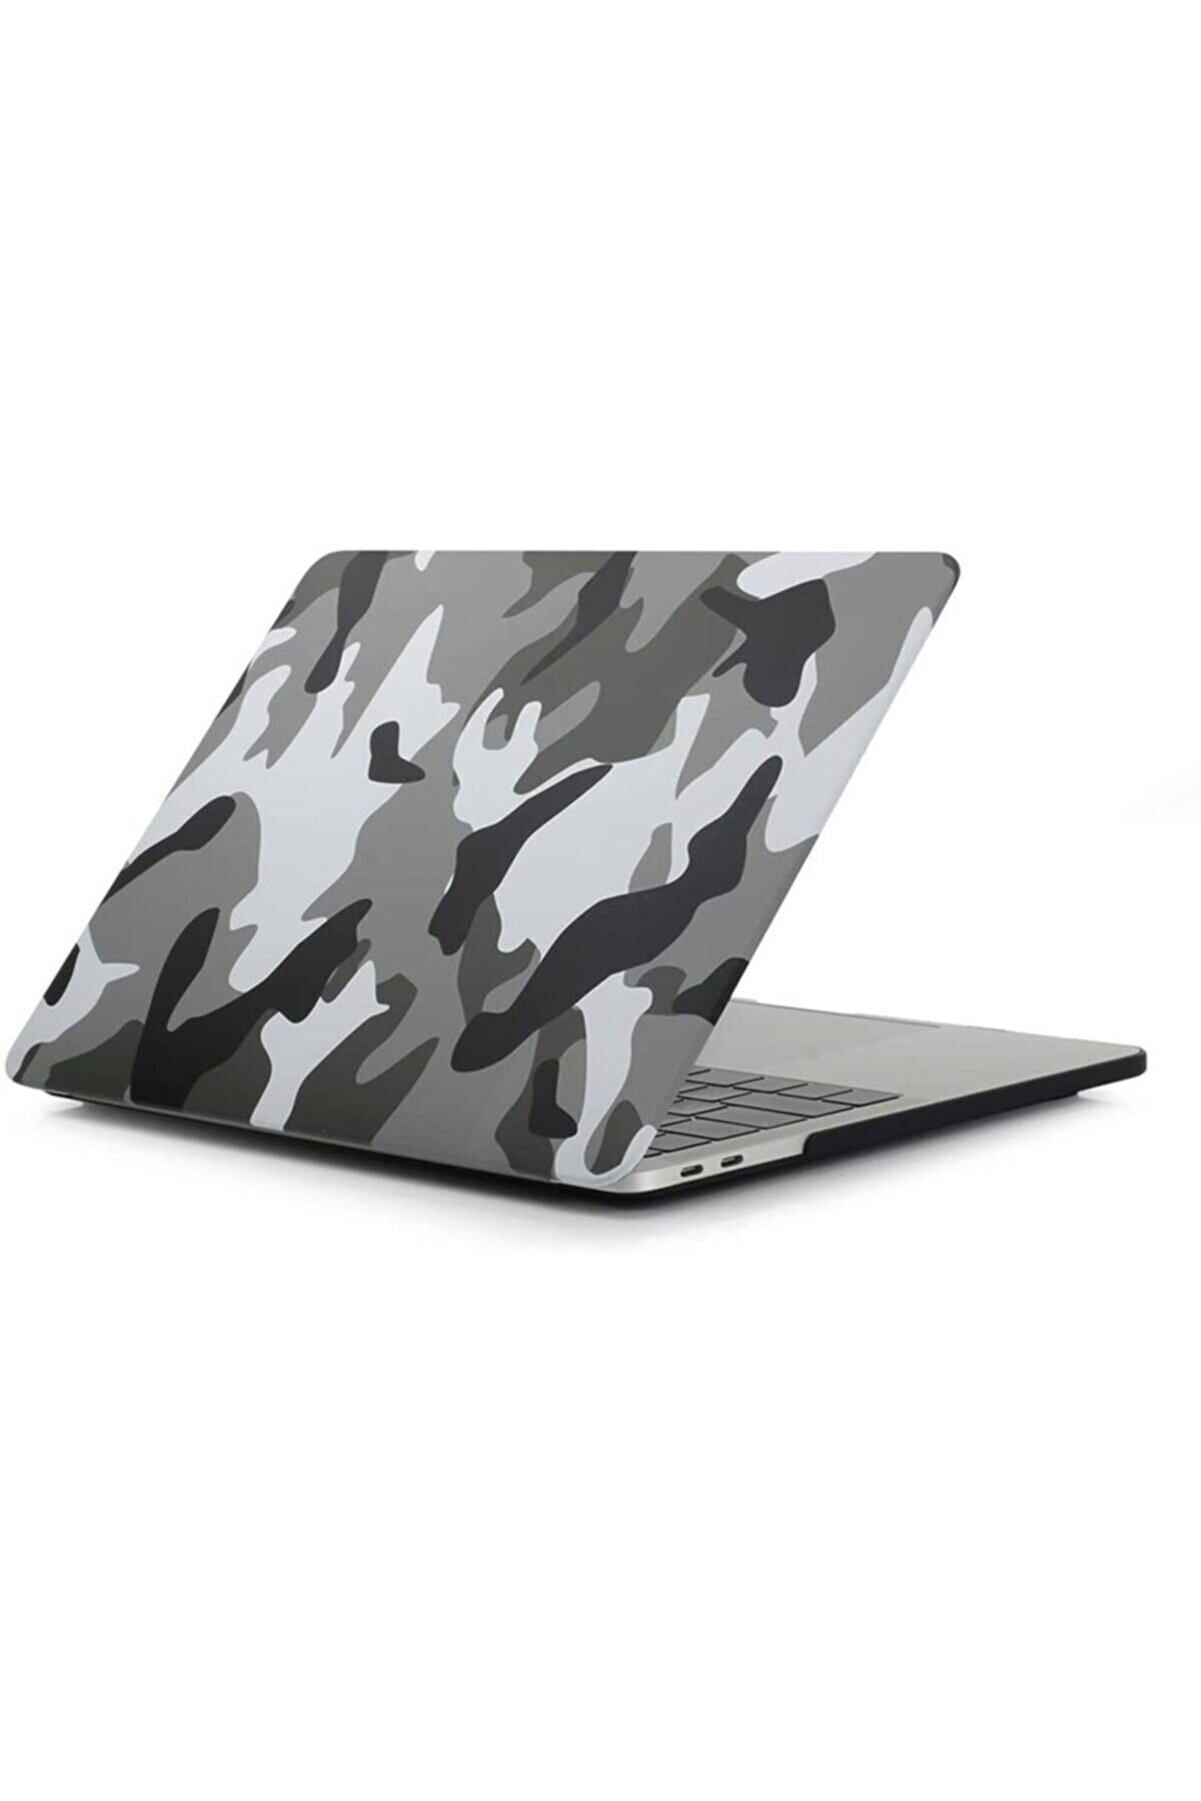 "CODEGEN Apple 13"" Macbook Air 2020 (m1) A2337 Kamuflaj Kılıf Koruyucu Kapak Cmatm-133cf"